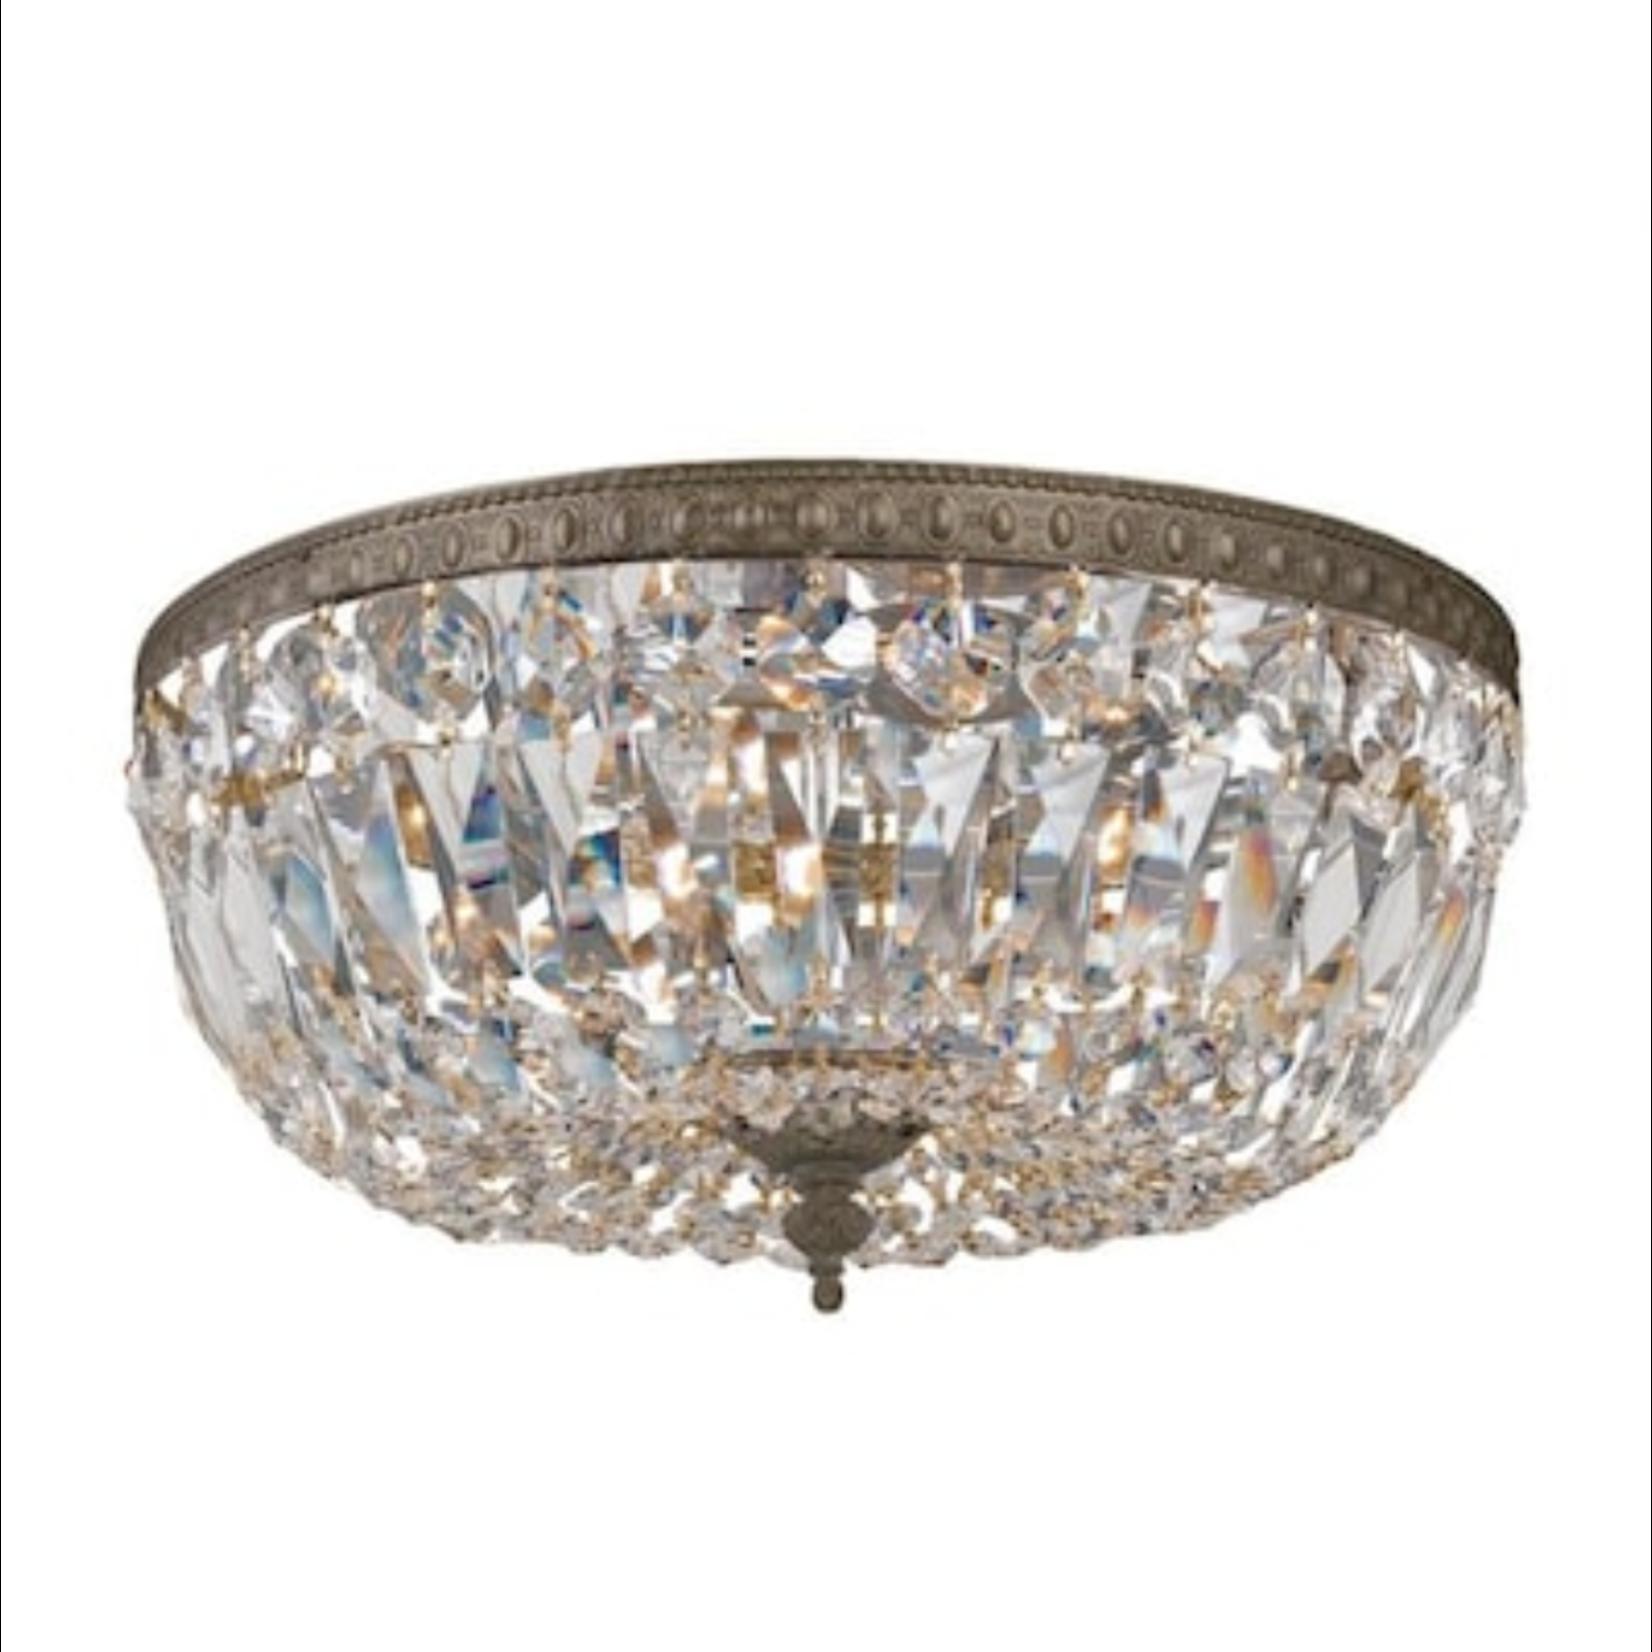 10324 Crystorama 3-Light Bronze Ceiling Mount Light